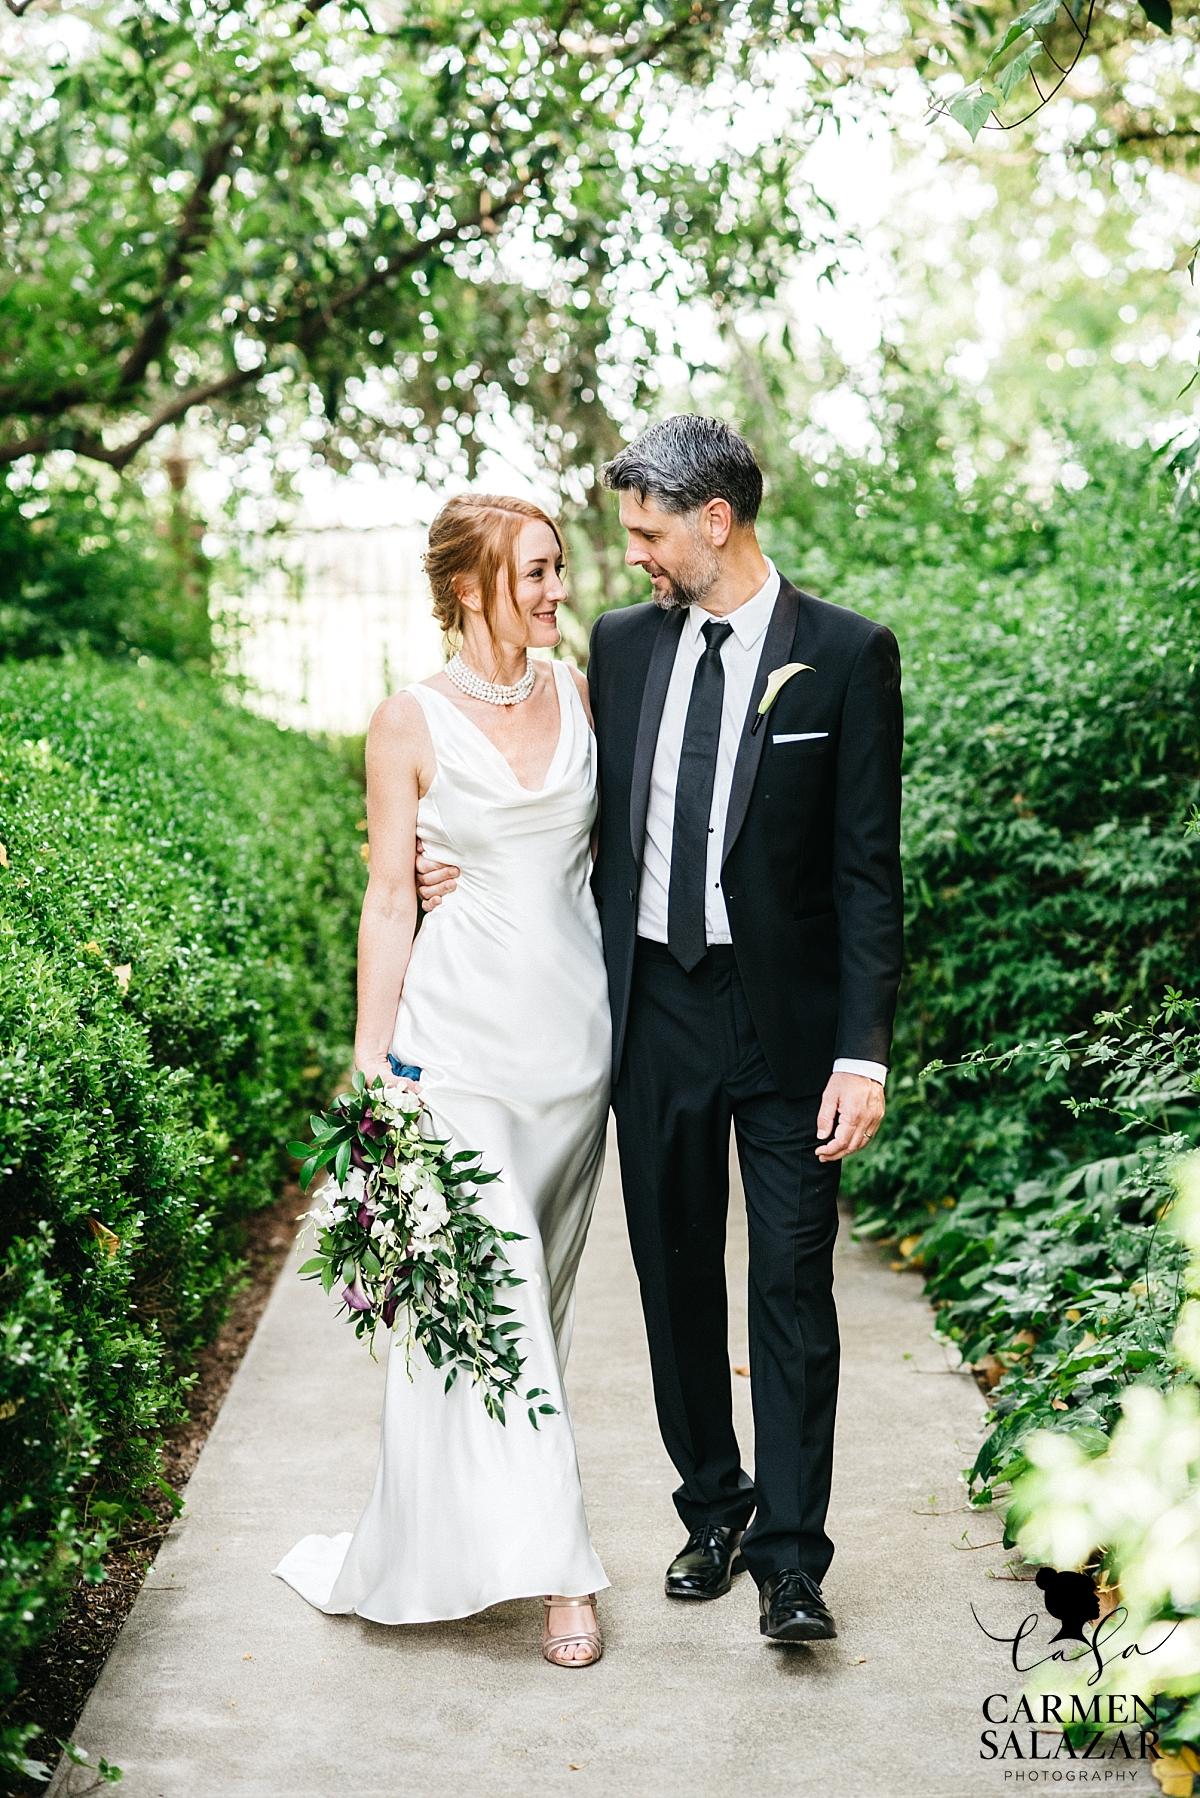 Winters wedding portrait photography - Carmen Salazar